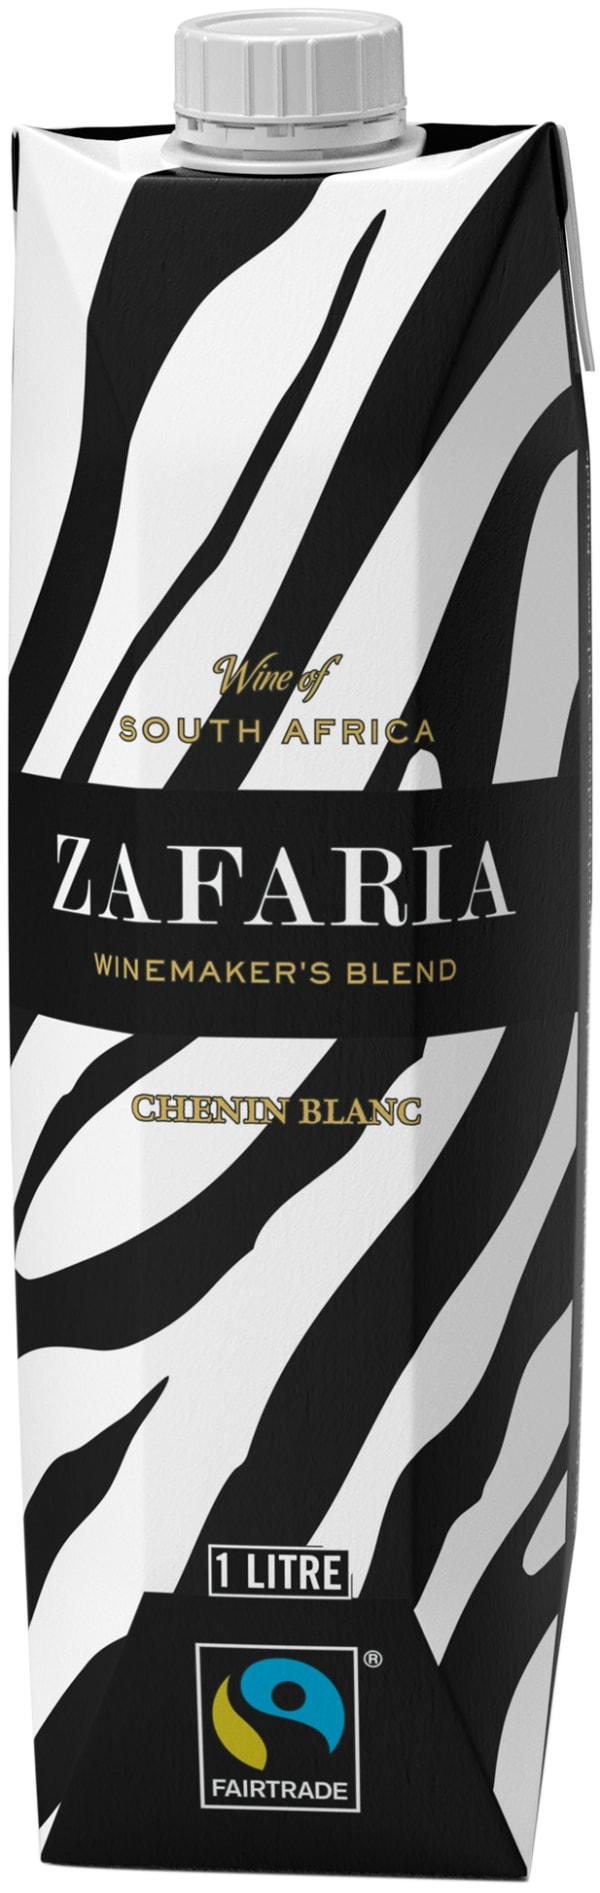 Zafaria Winemakers Blend Chenin Blanc 2020 carton package